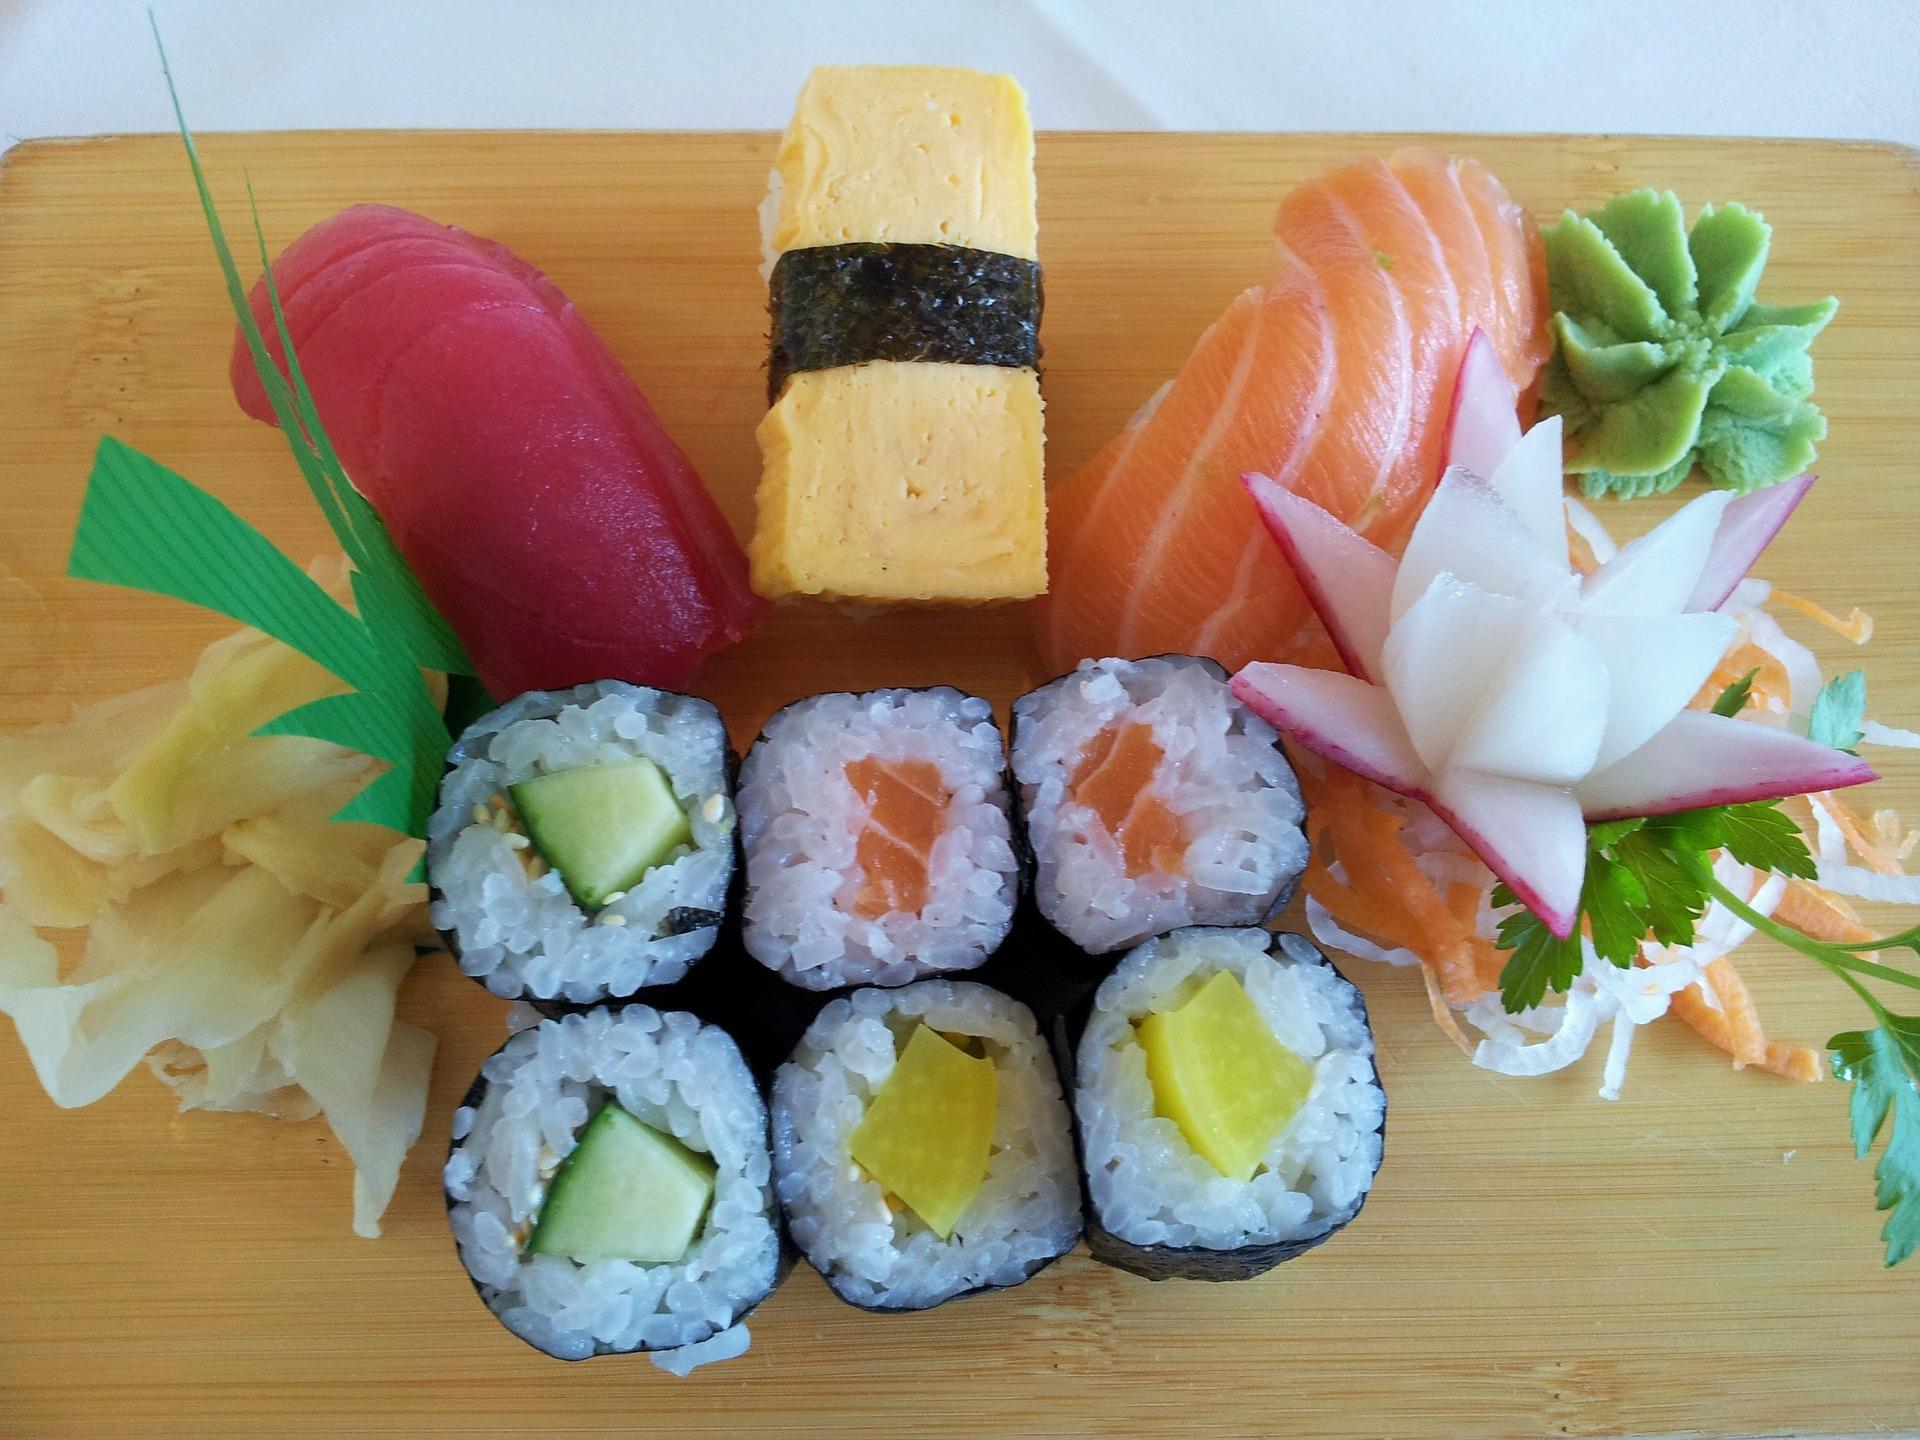 Planka med olika sorters sushi